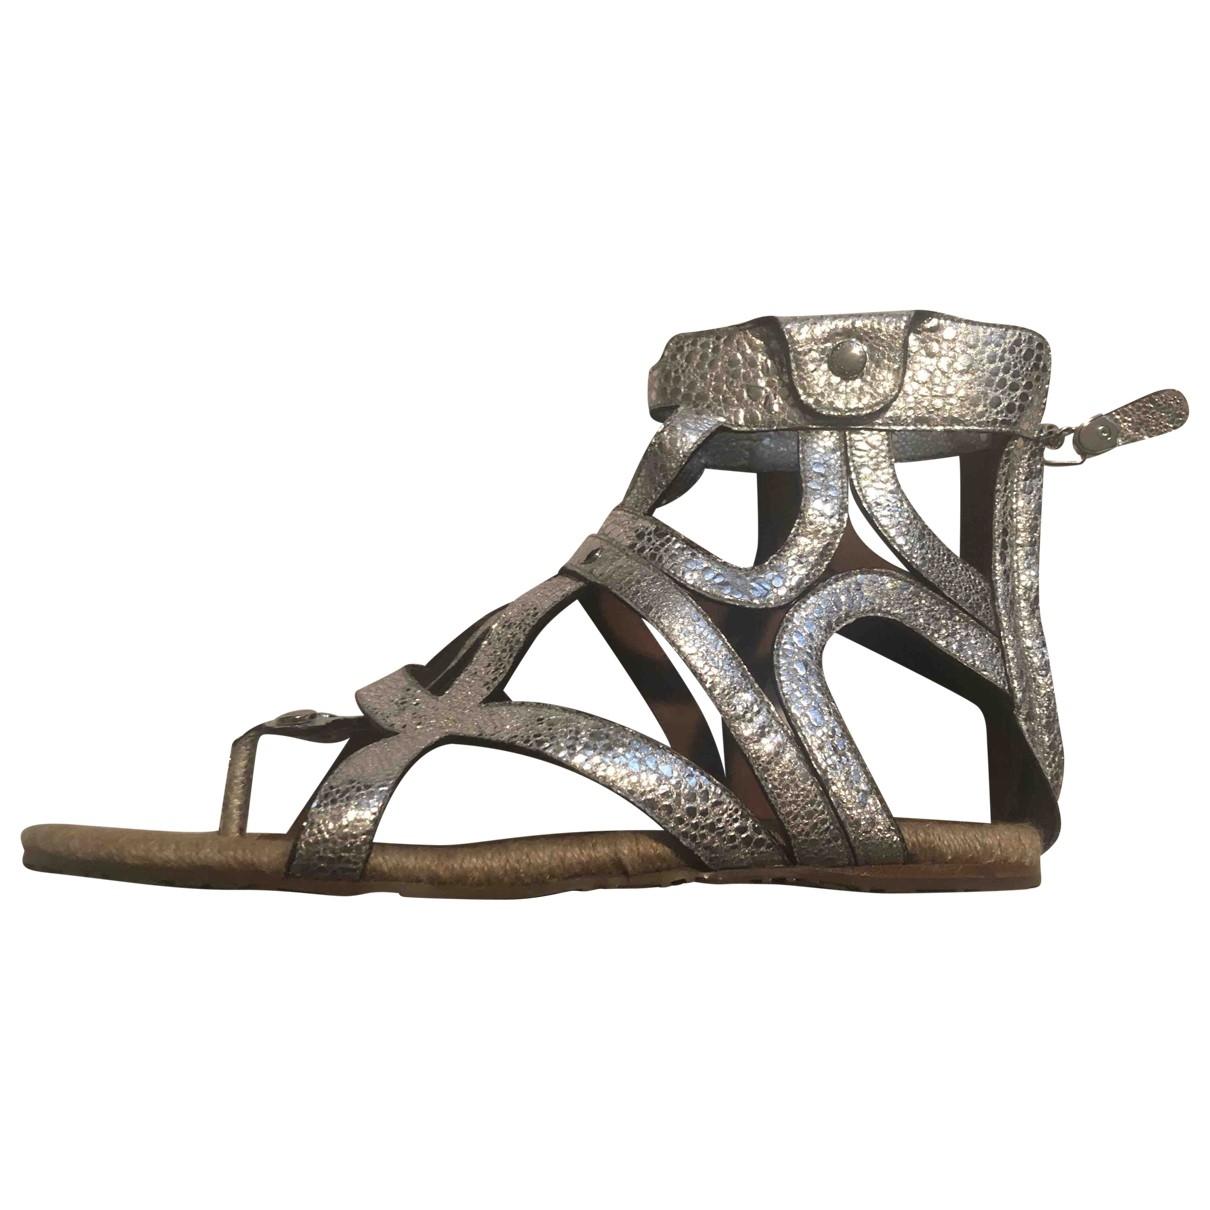 Dolce & Gabbana \N Silver Leather Sandals for Women 39 EU